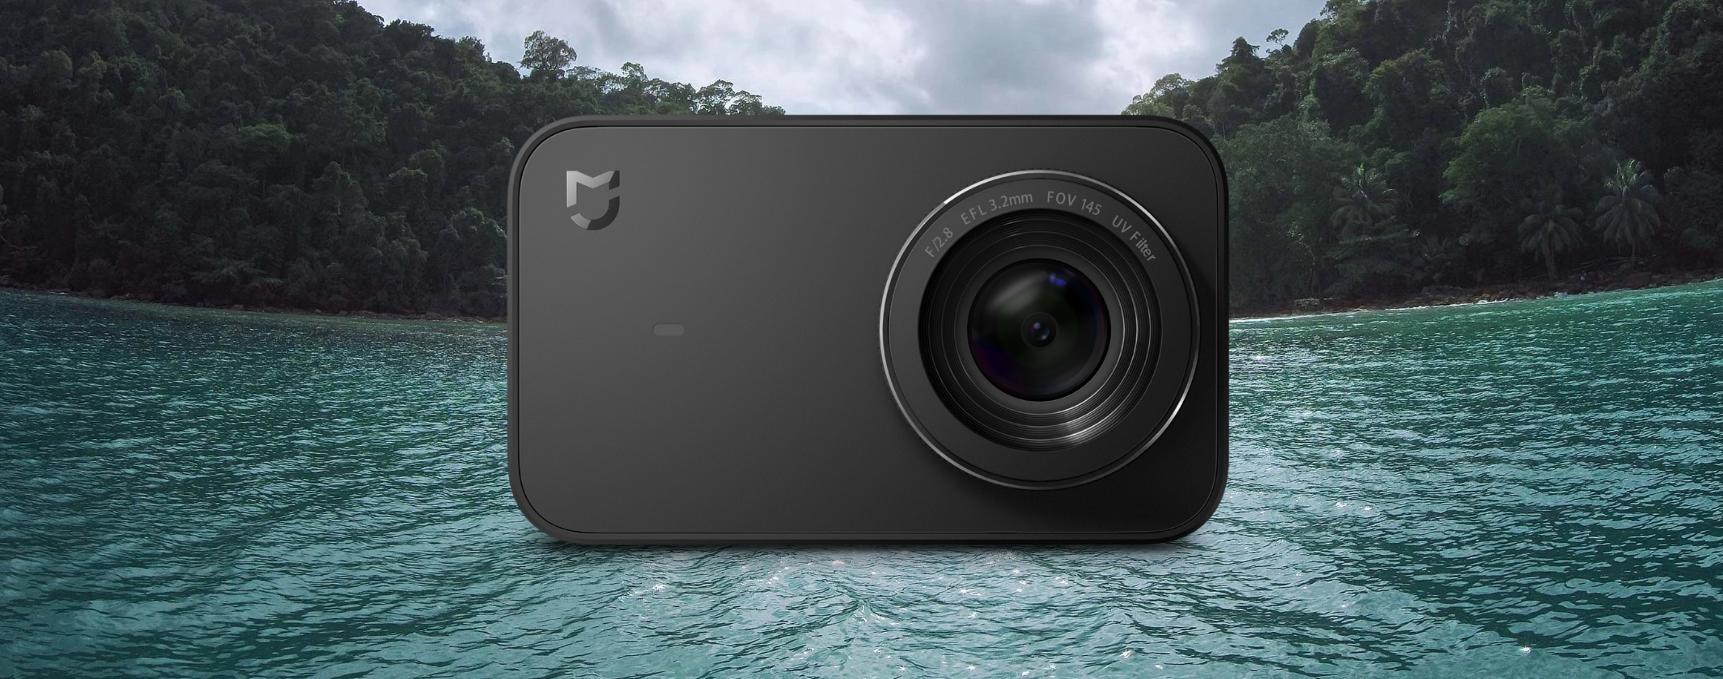 Xiaomi Mi Action Cam 4k